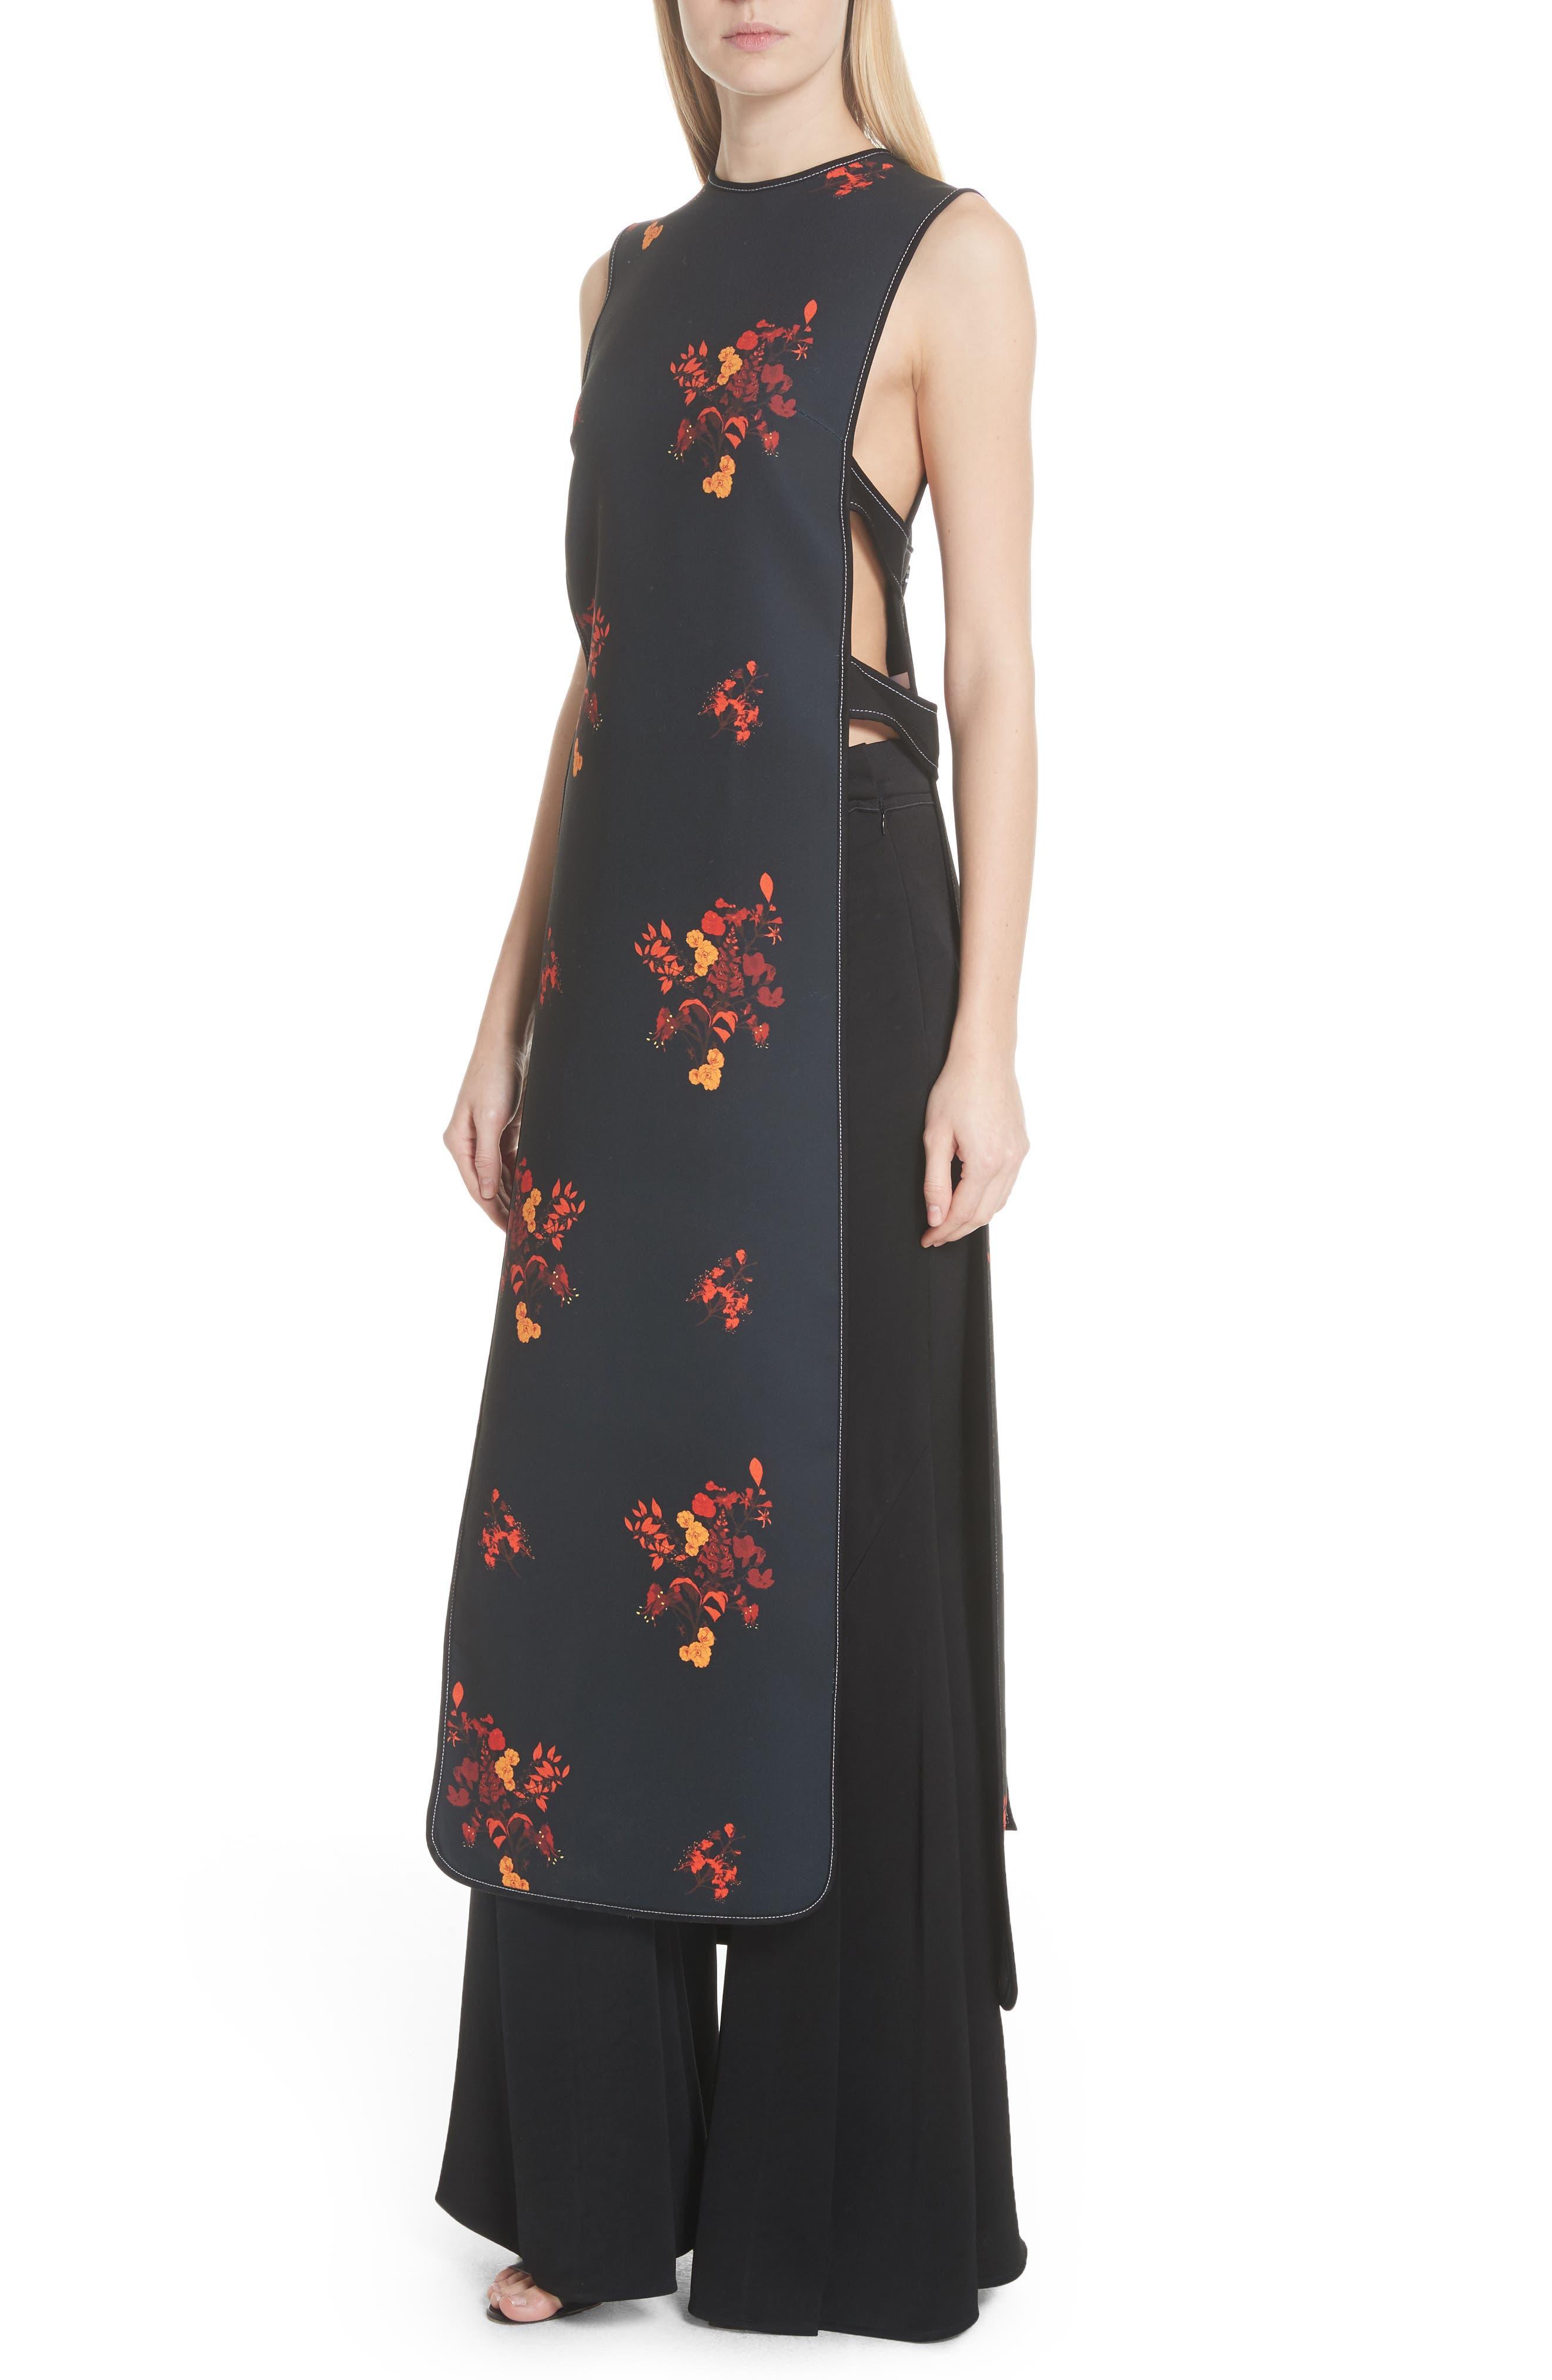 Judy Sleeveless Crepe Tunic Dress,                             Alternate thumbnail 4, color,                             800